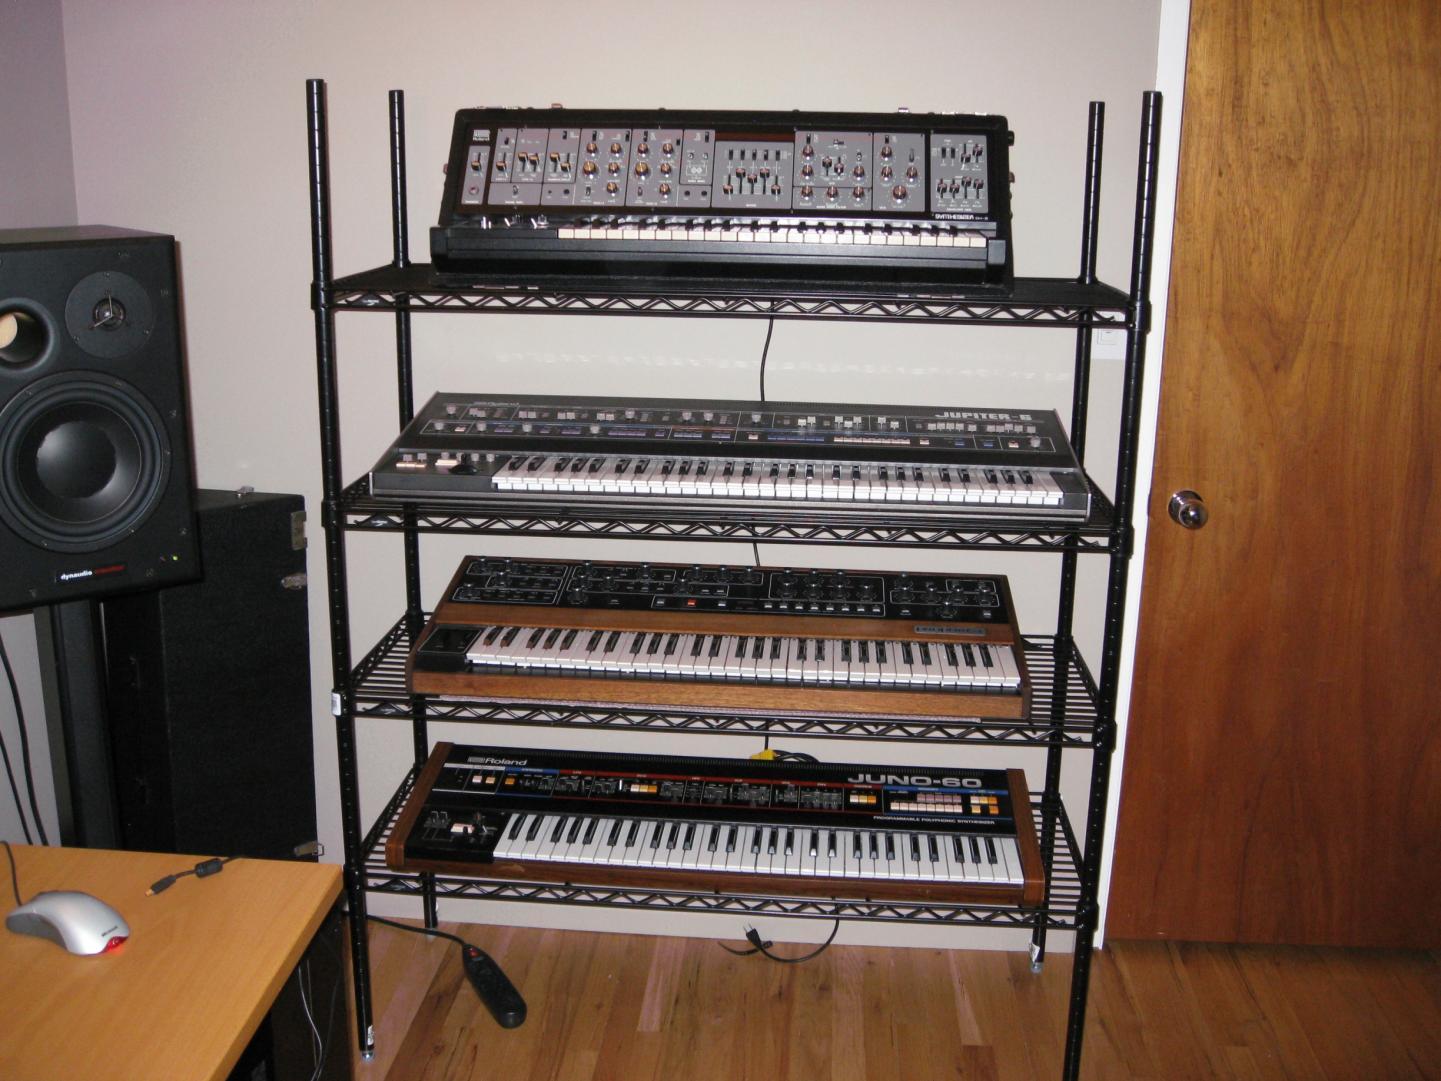 keyboard stands shelves gearslutz pro audio community. Black Bedroom Furniture Sets. Home Design Ideas